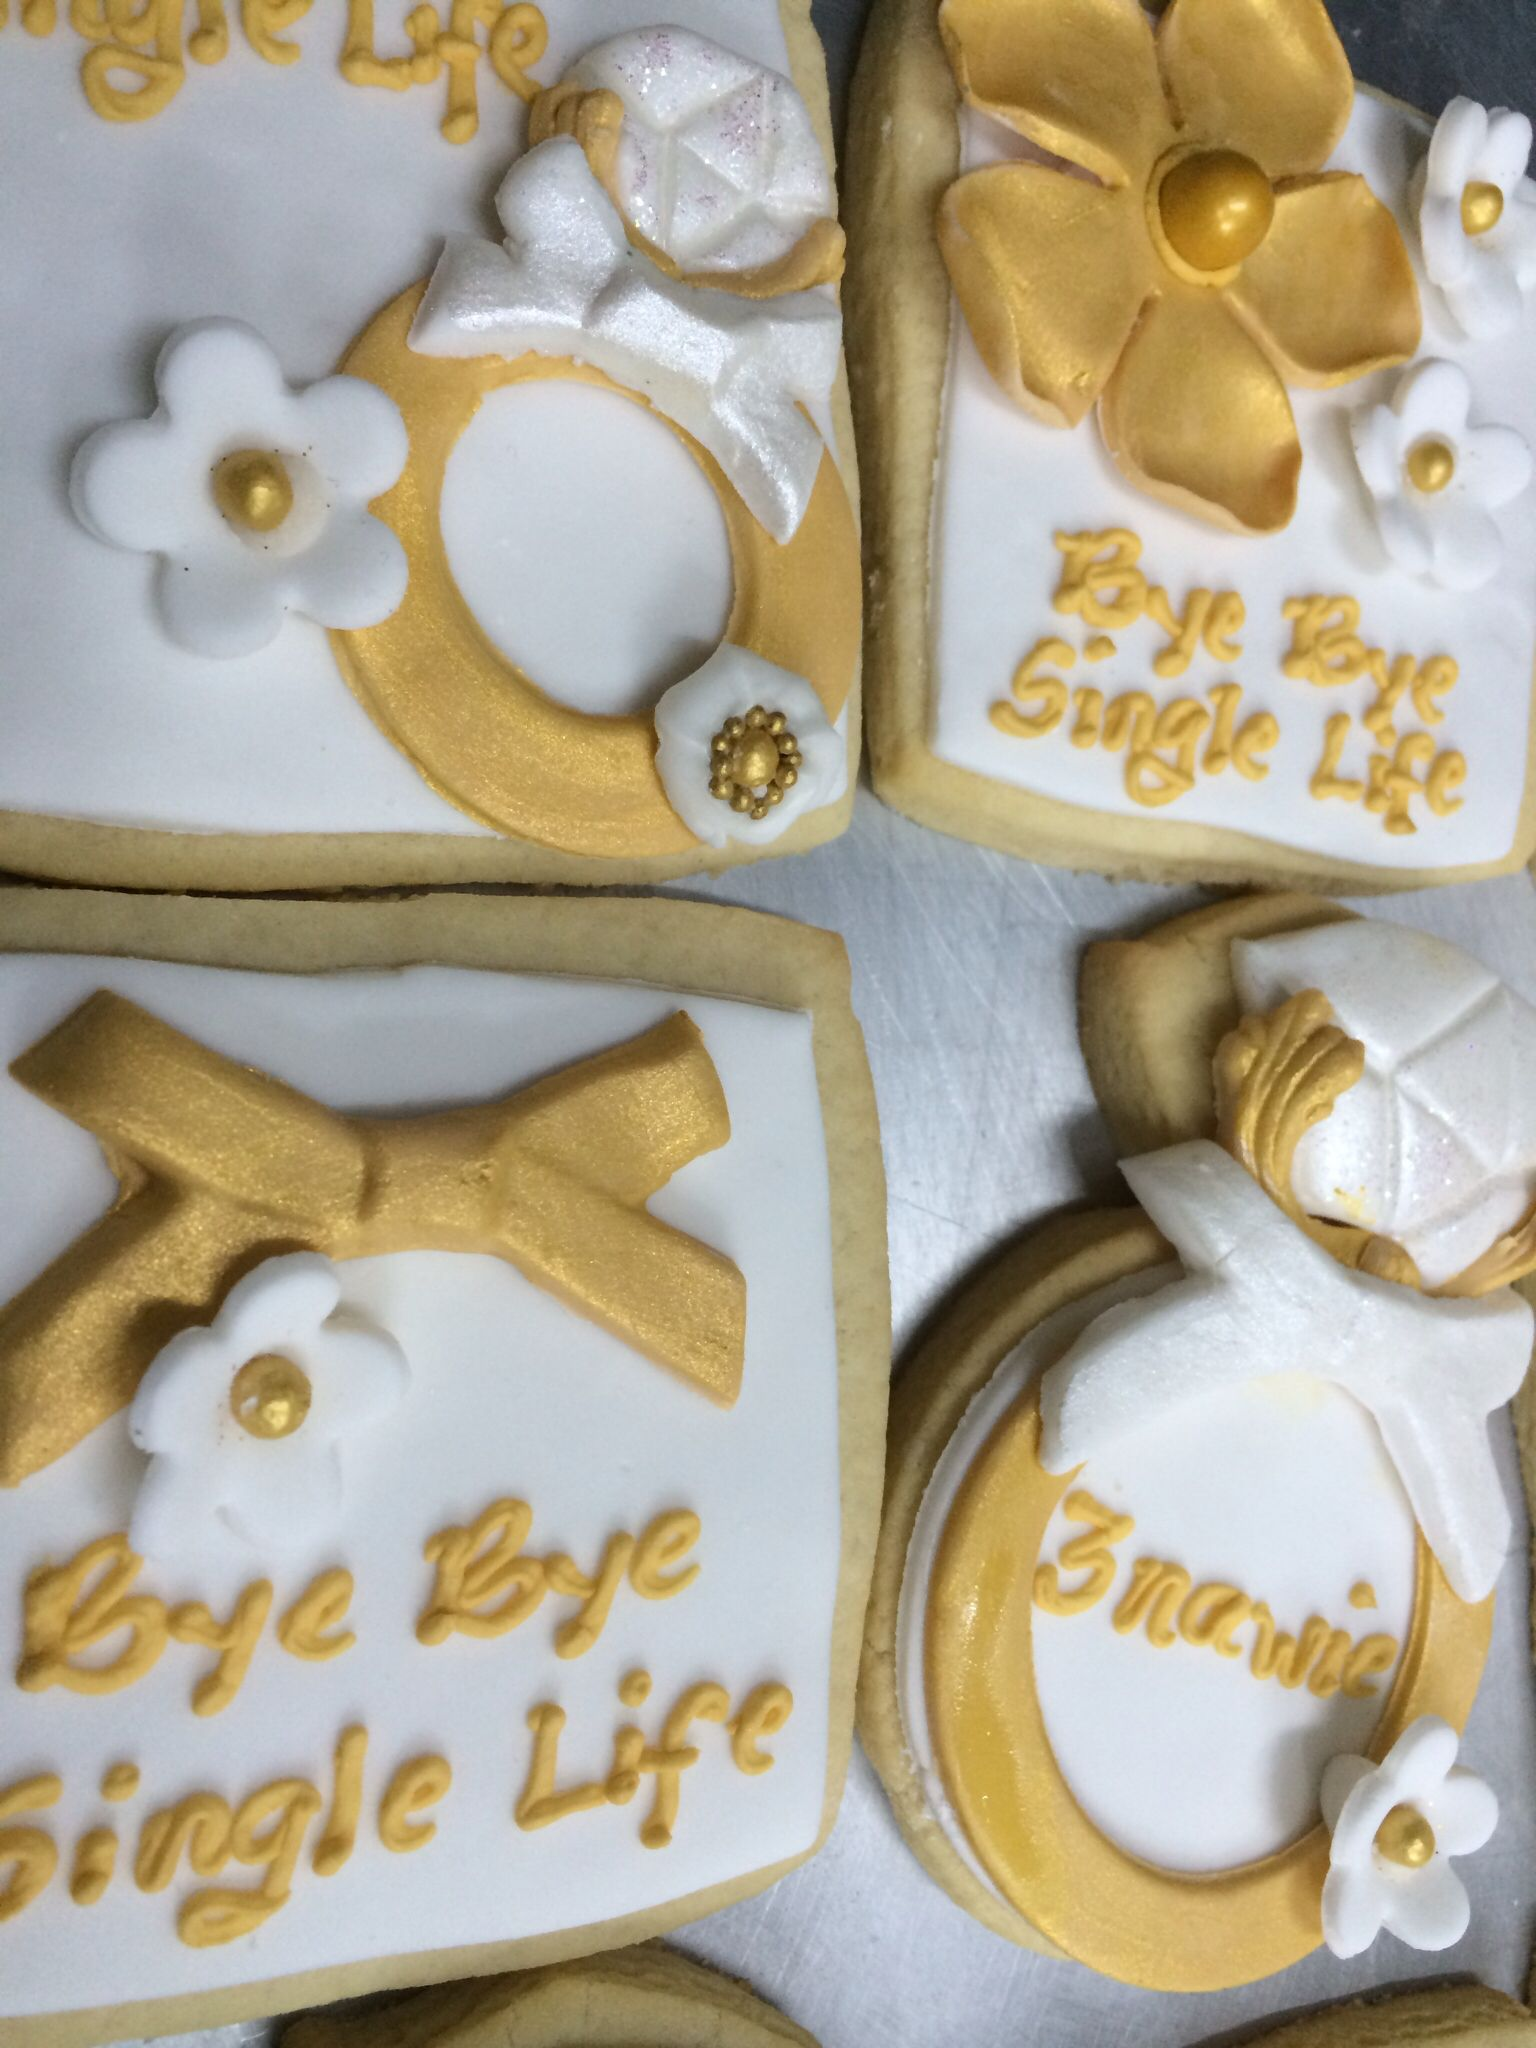 Pin By Alicia Joyner On The Pantry Sugar Cookie Cookies Single Life